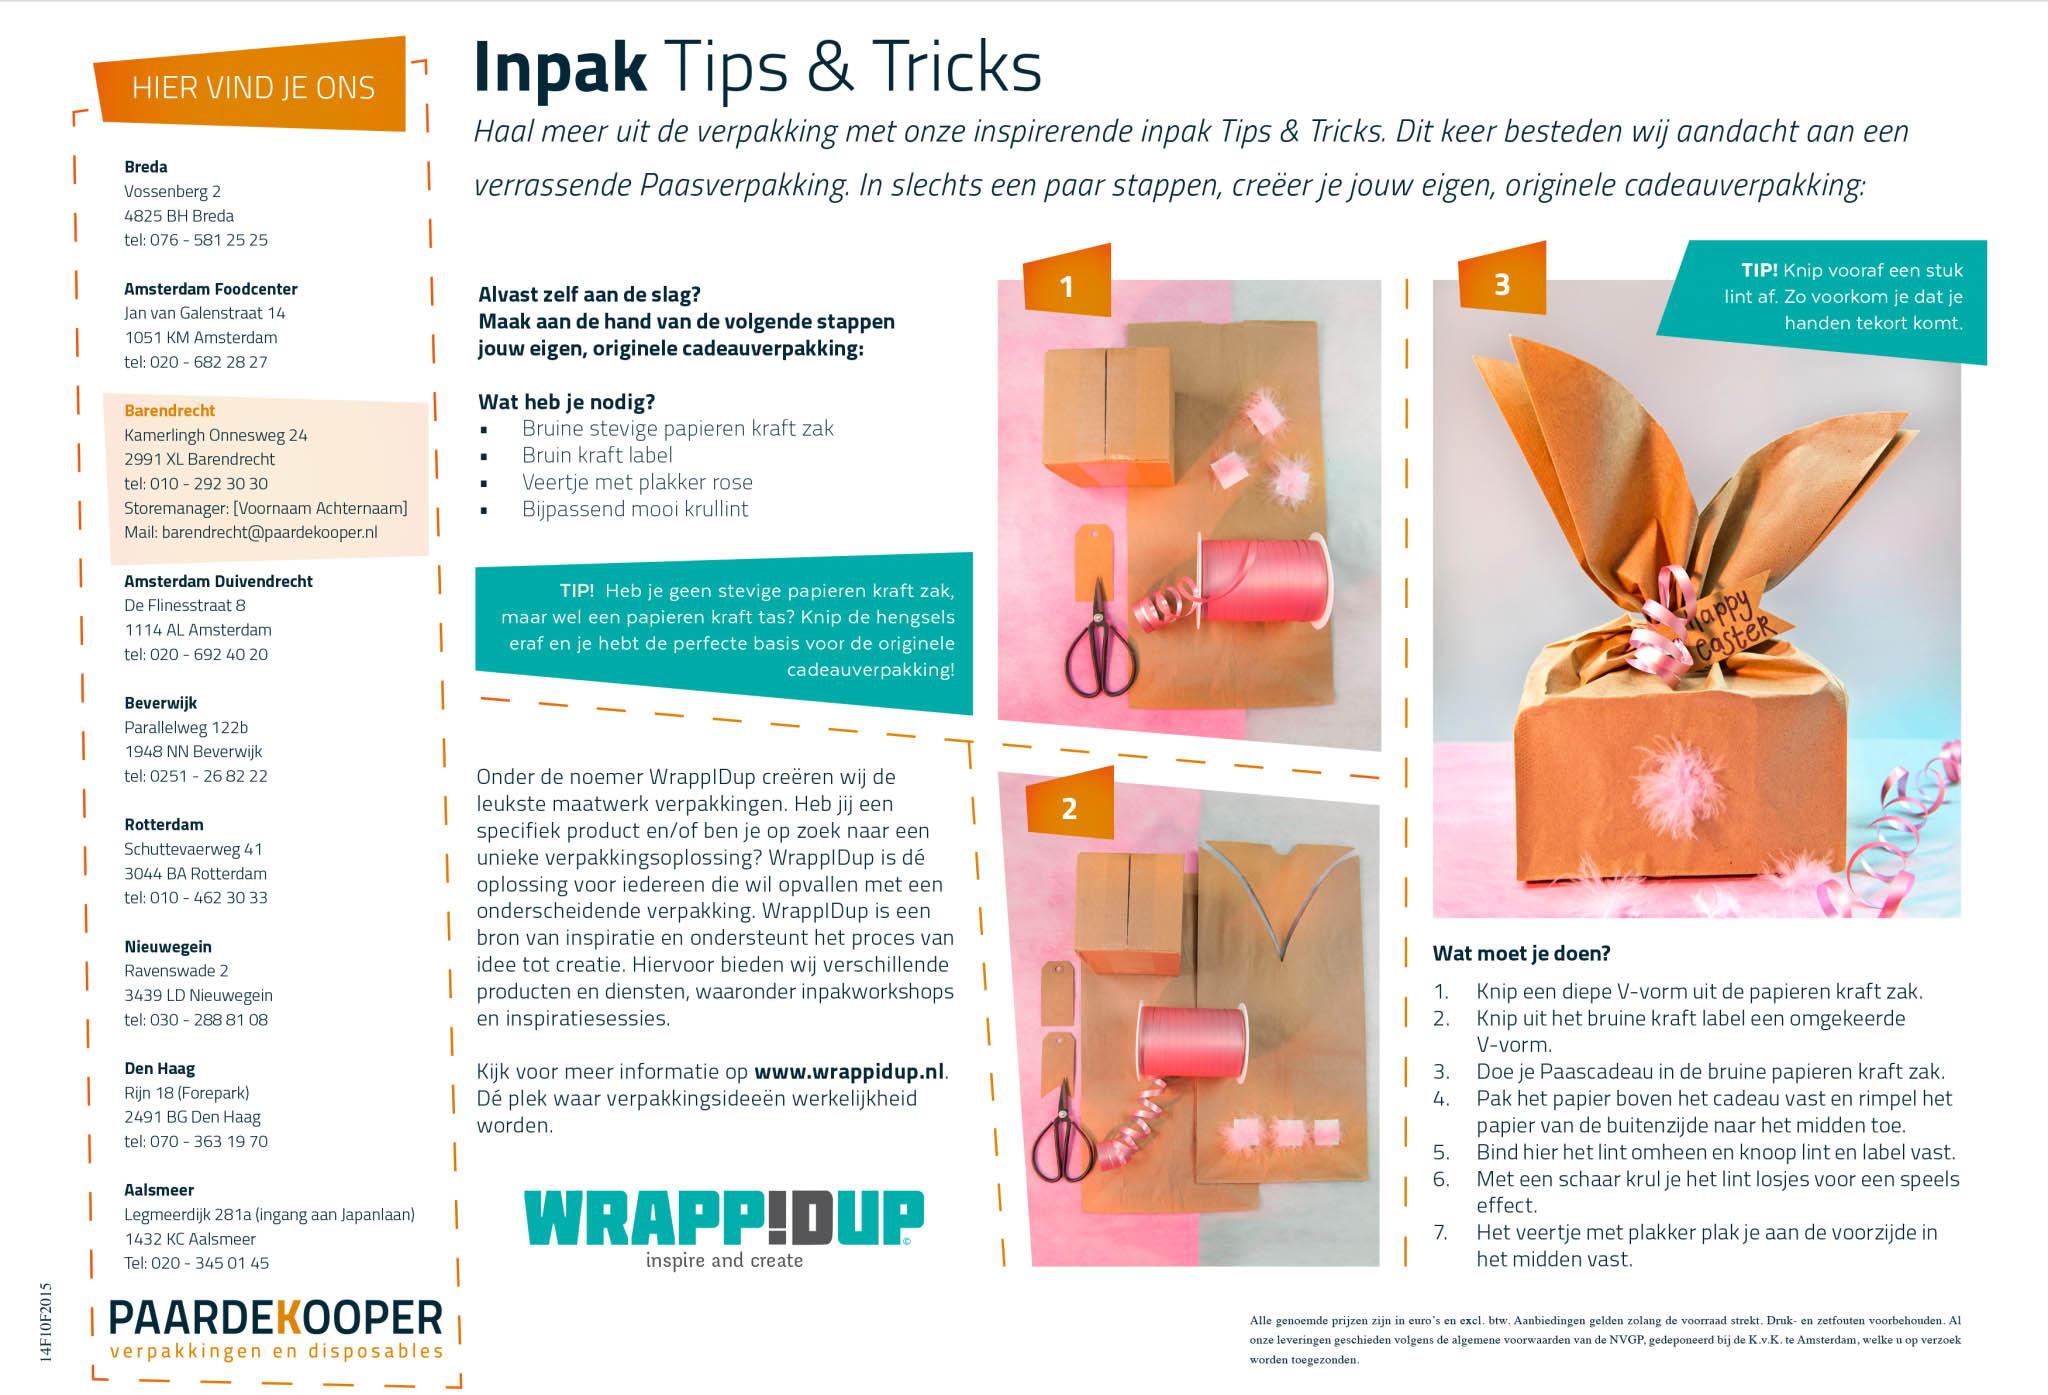 inpaktips en tricks paasverpakking